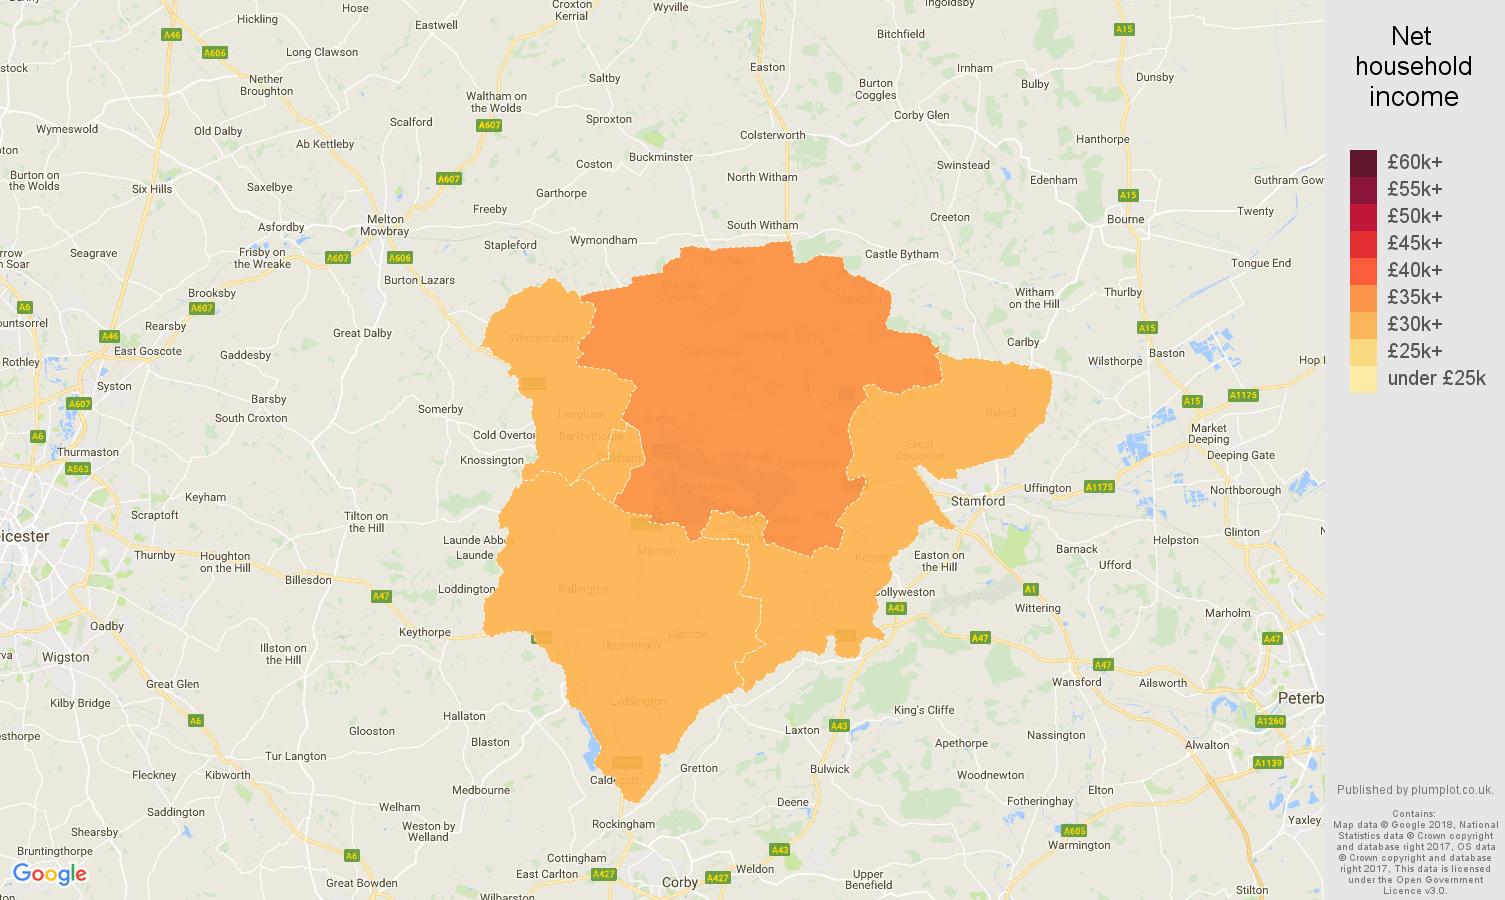 Rutland net household income map